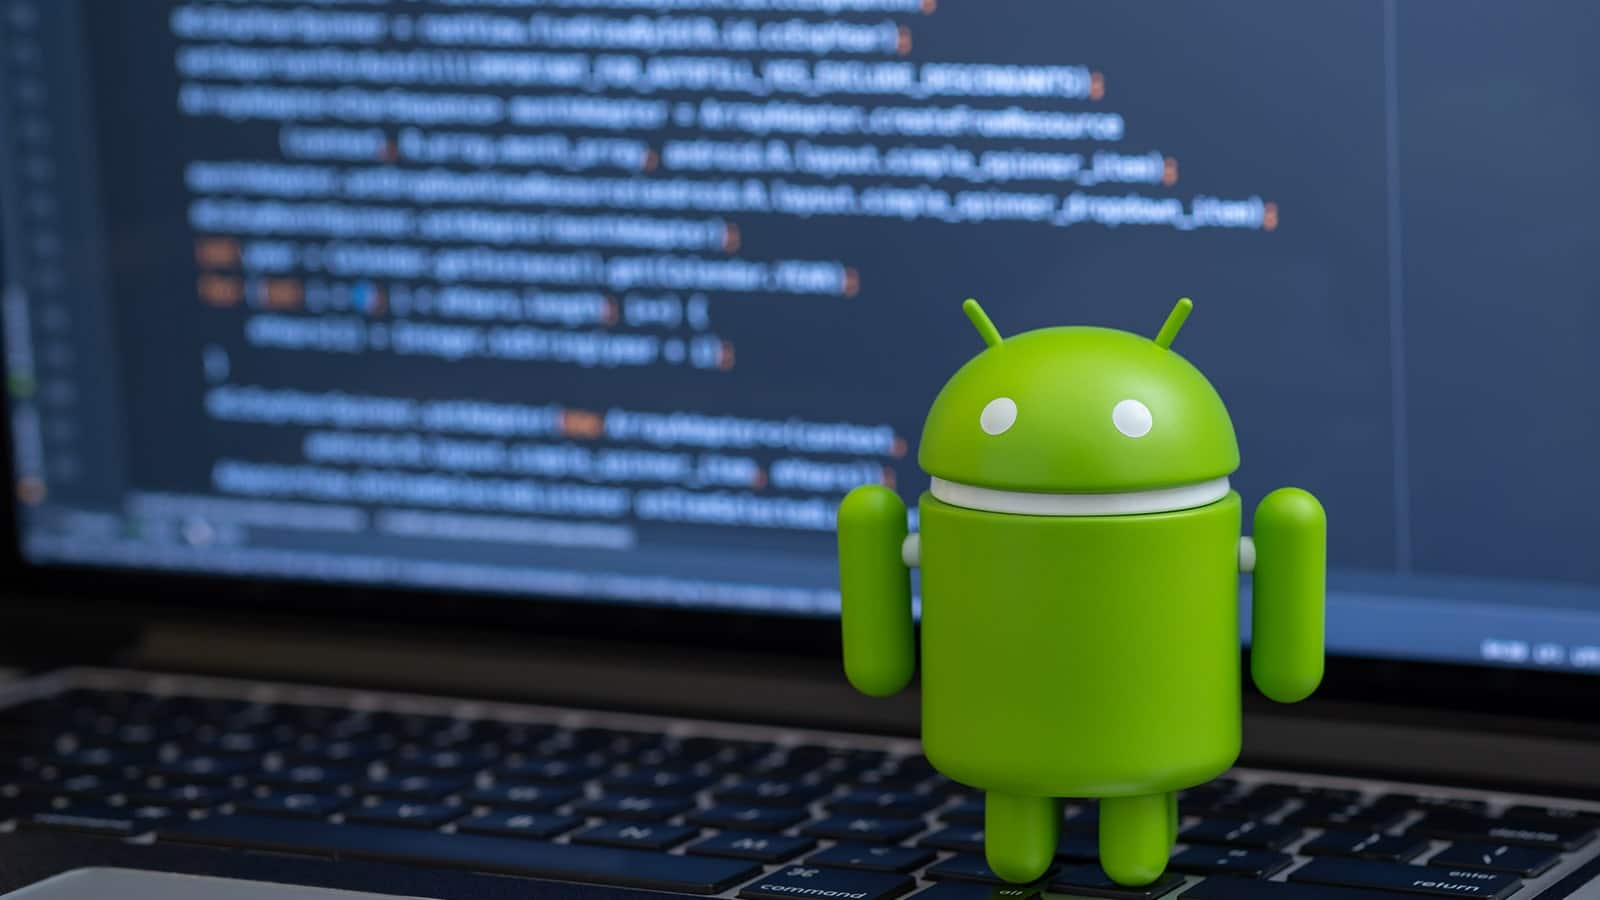 Android Uygulama Geliştirme 1 ~ Ajansso Web Solutions